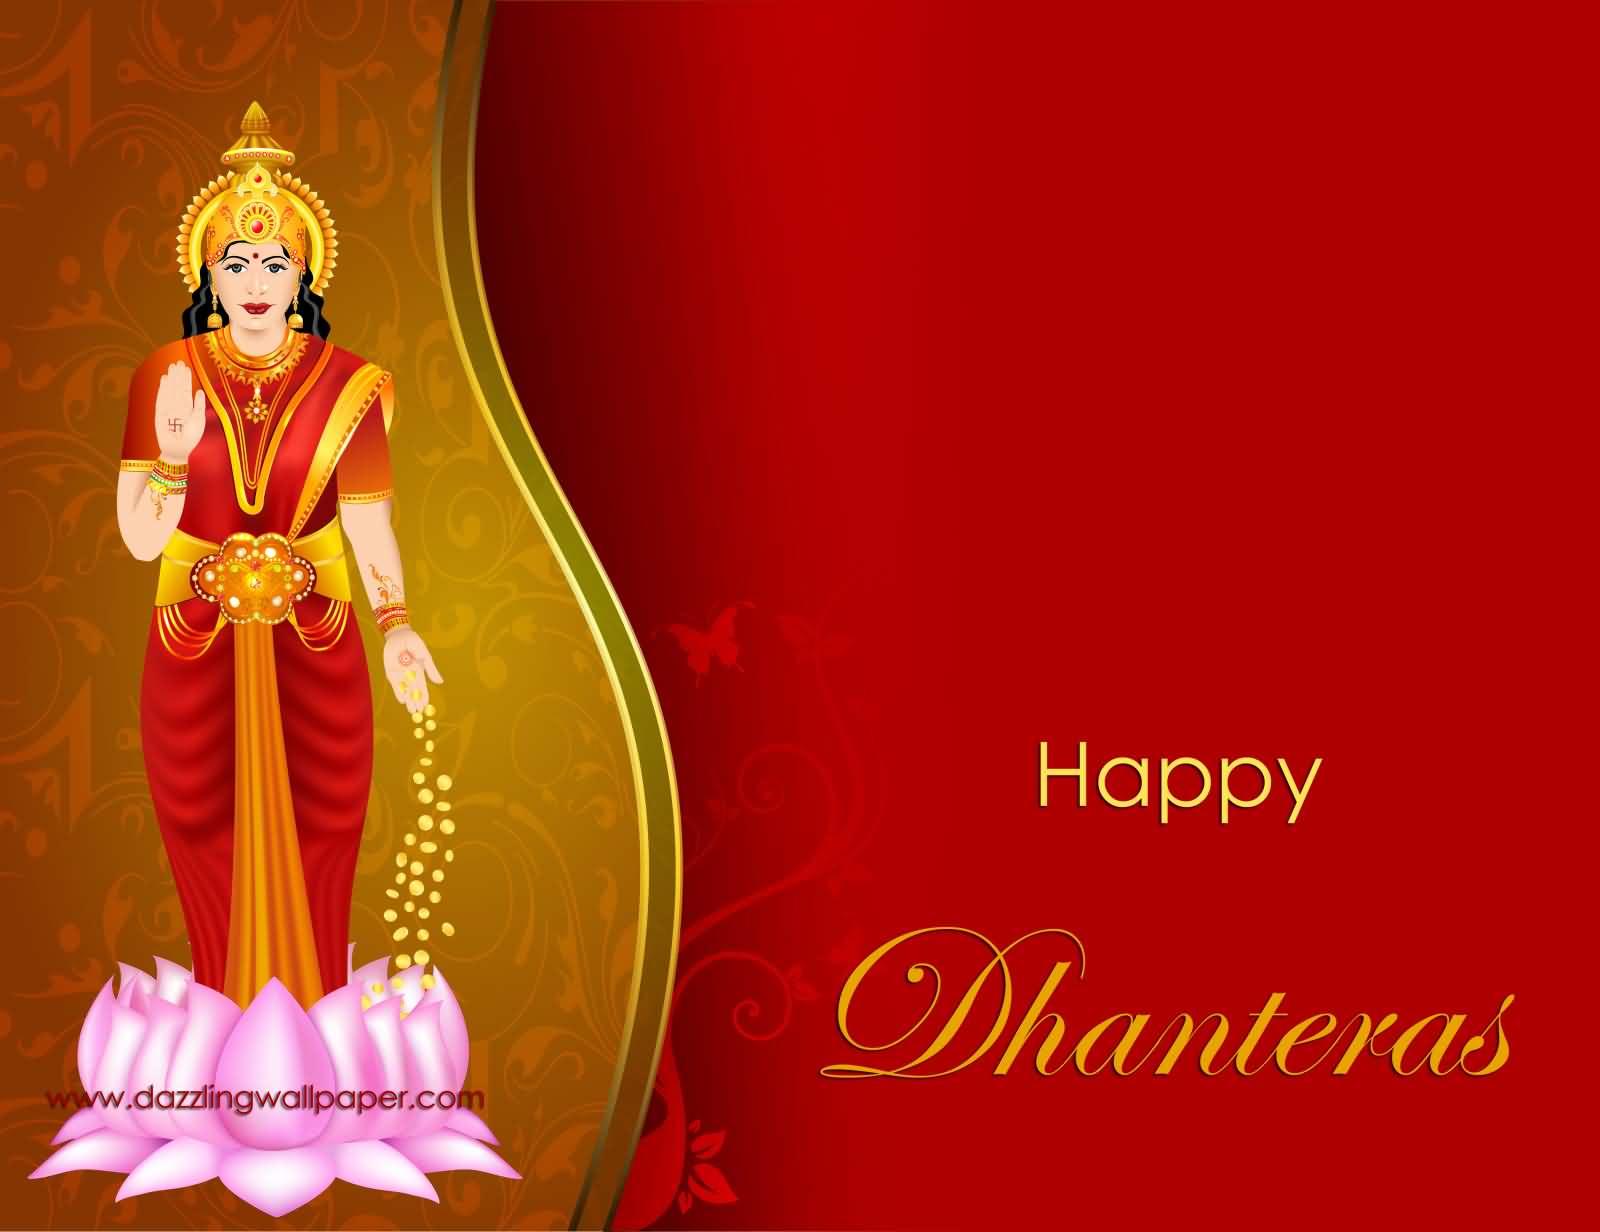 Happy dhanteras goddess lakshmi greeting card m4hsunfo